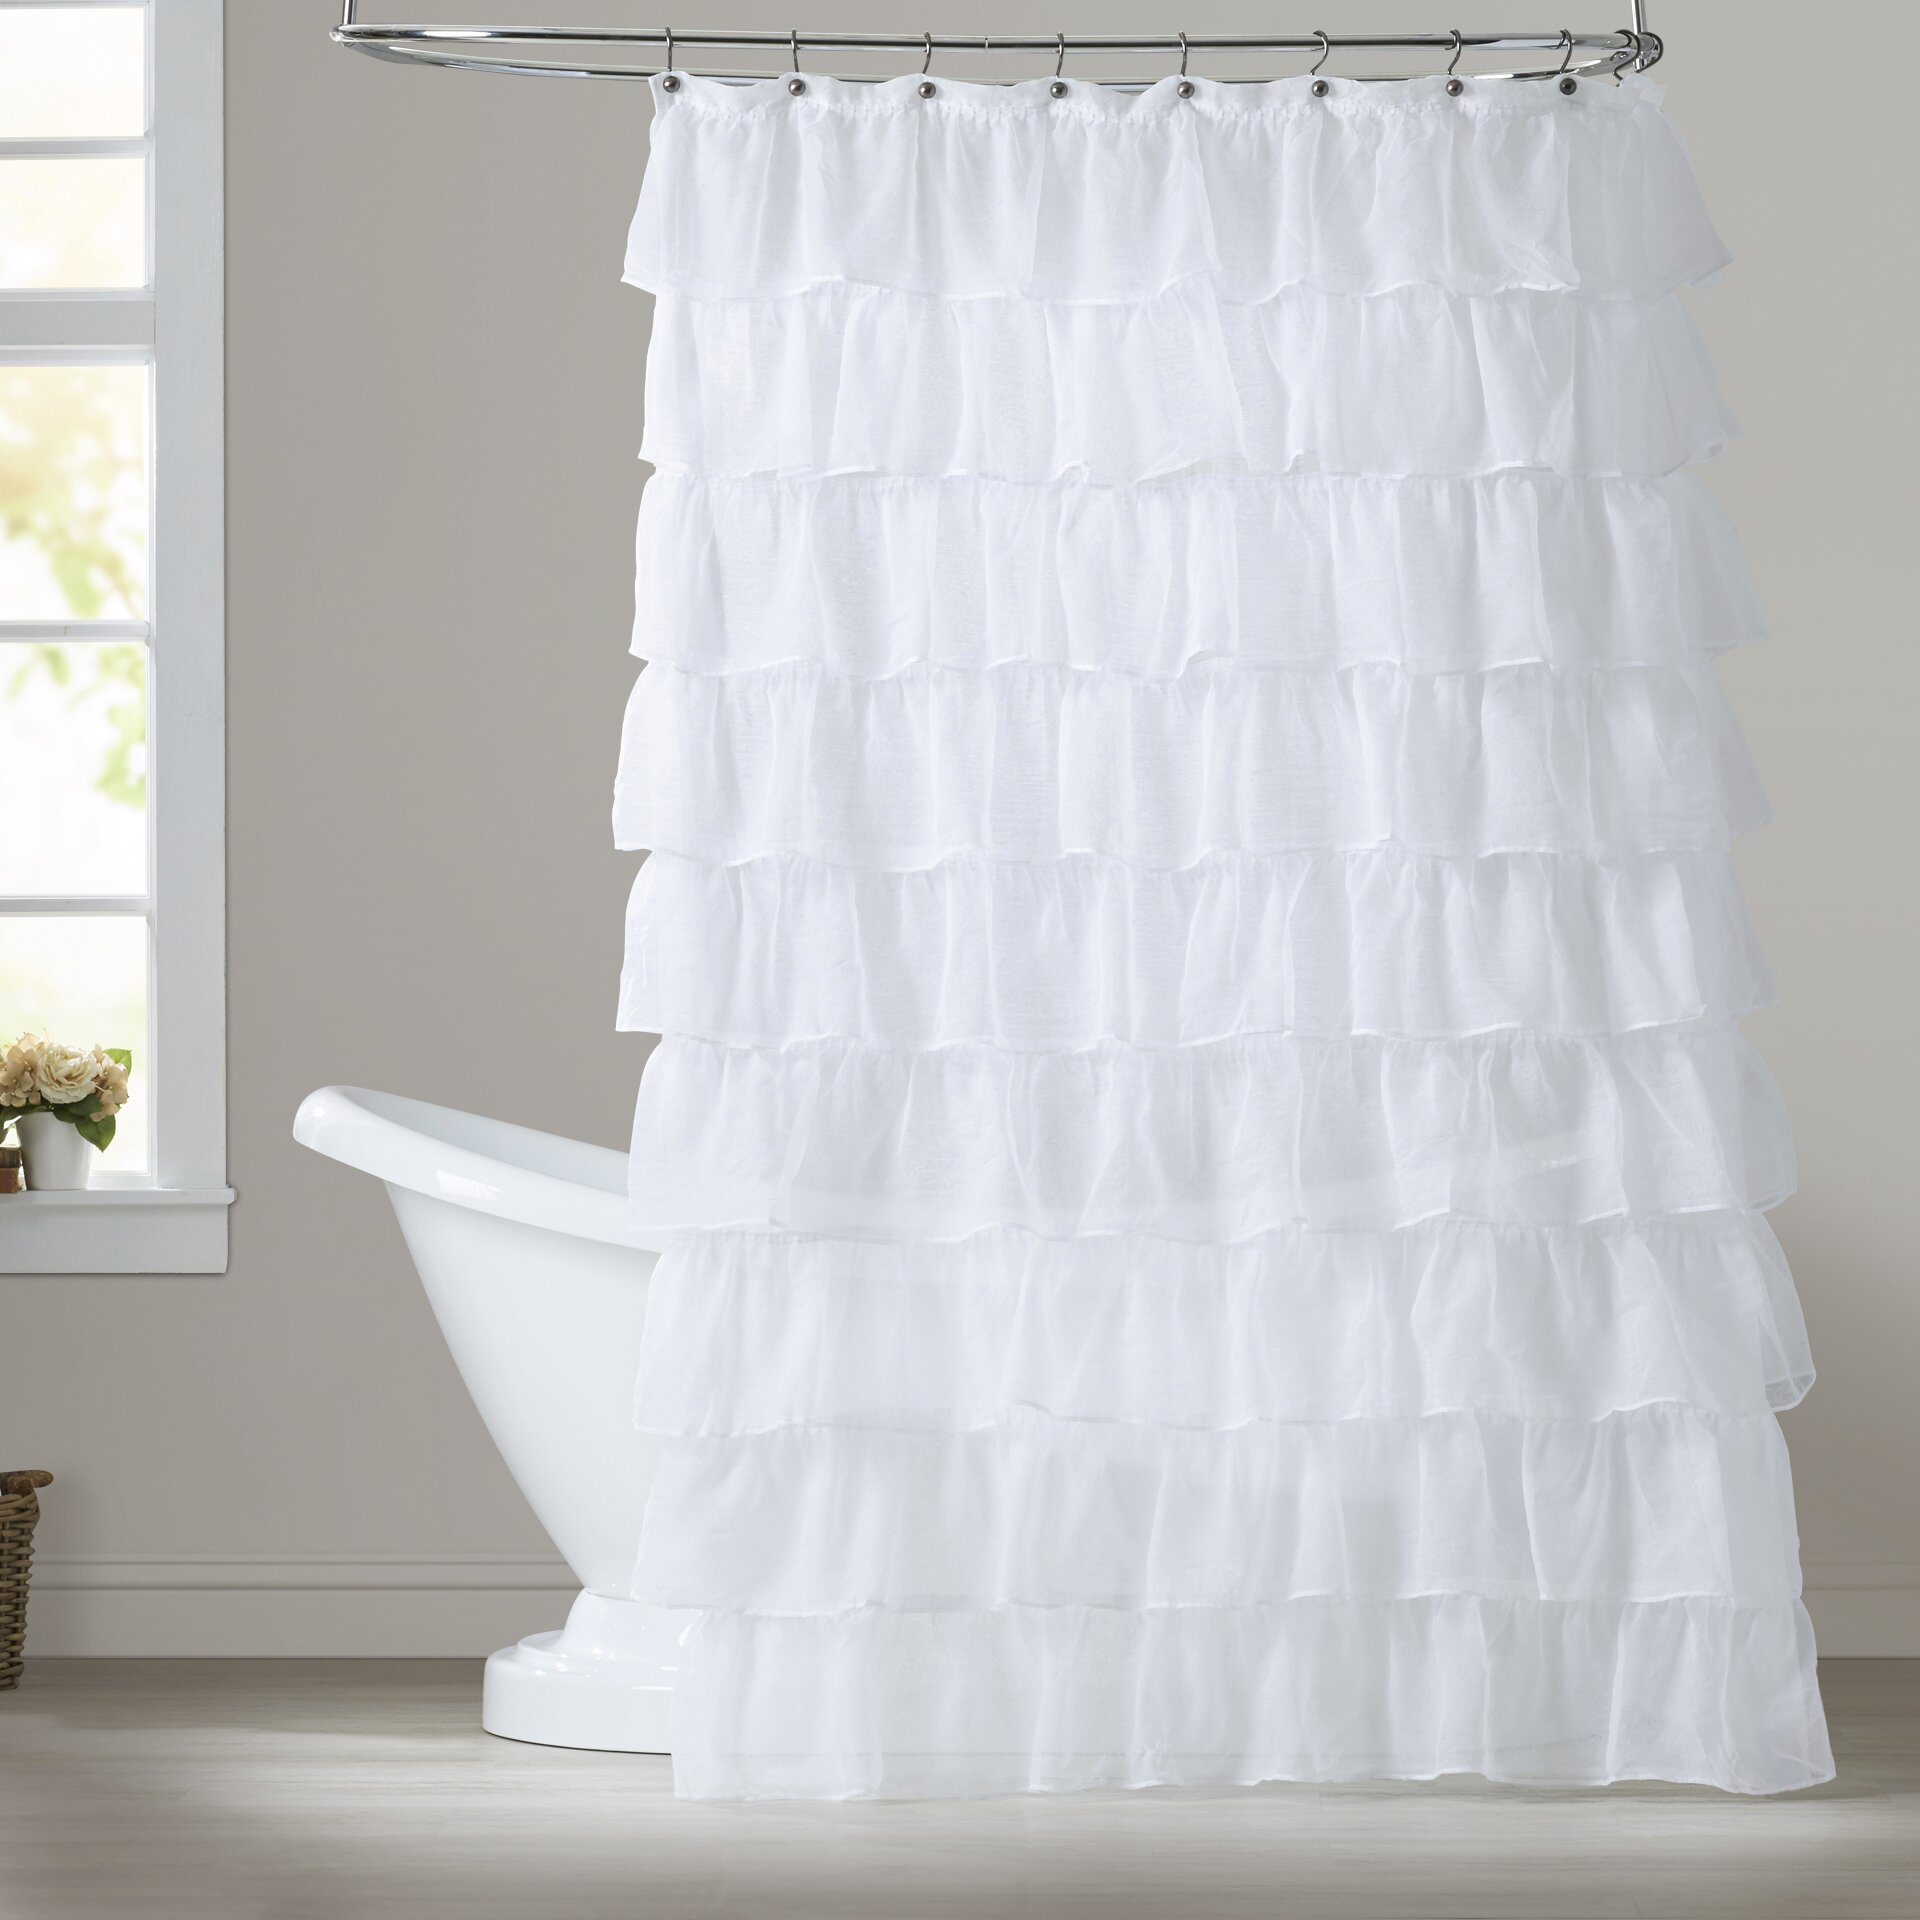 Lark Manor Rodemack Voile Ruffled Tier Shower Curtain